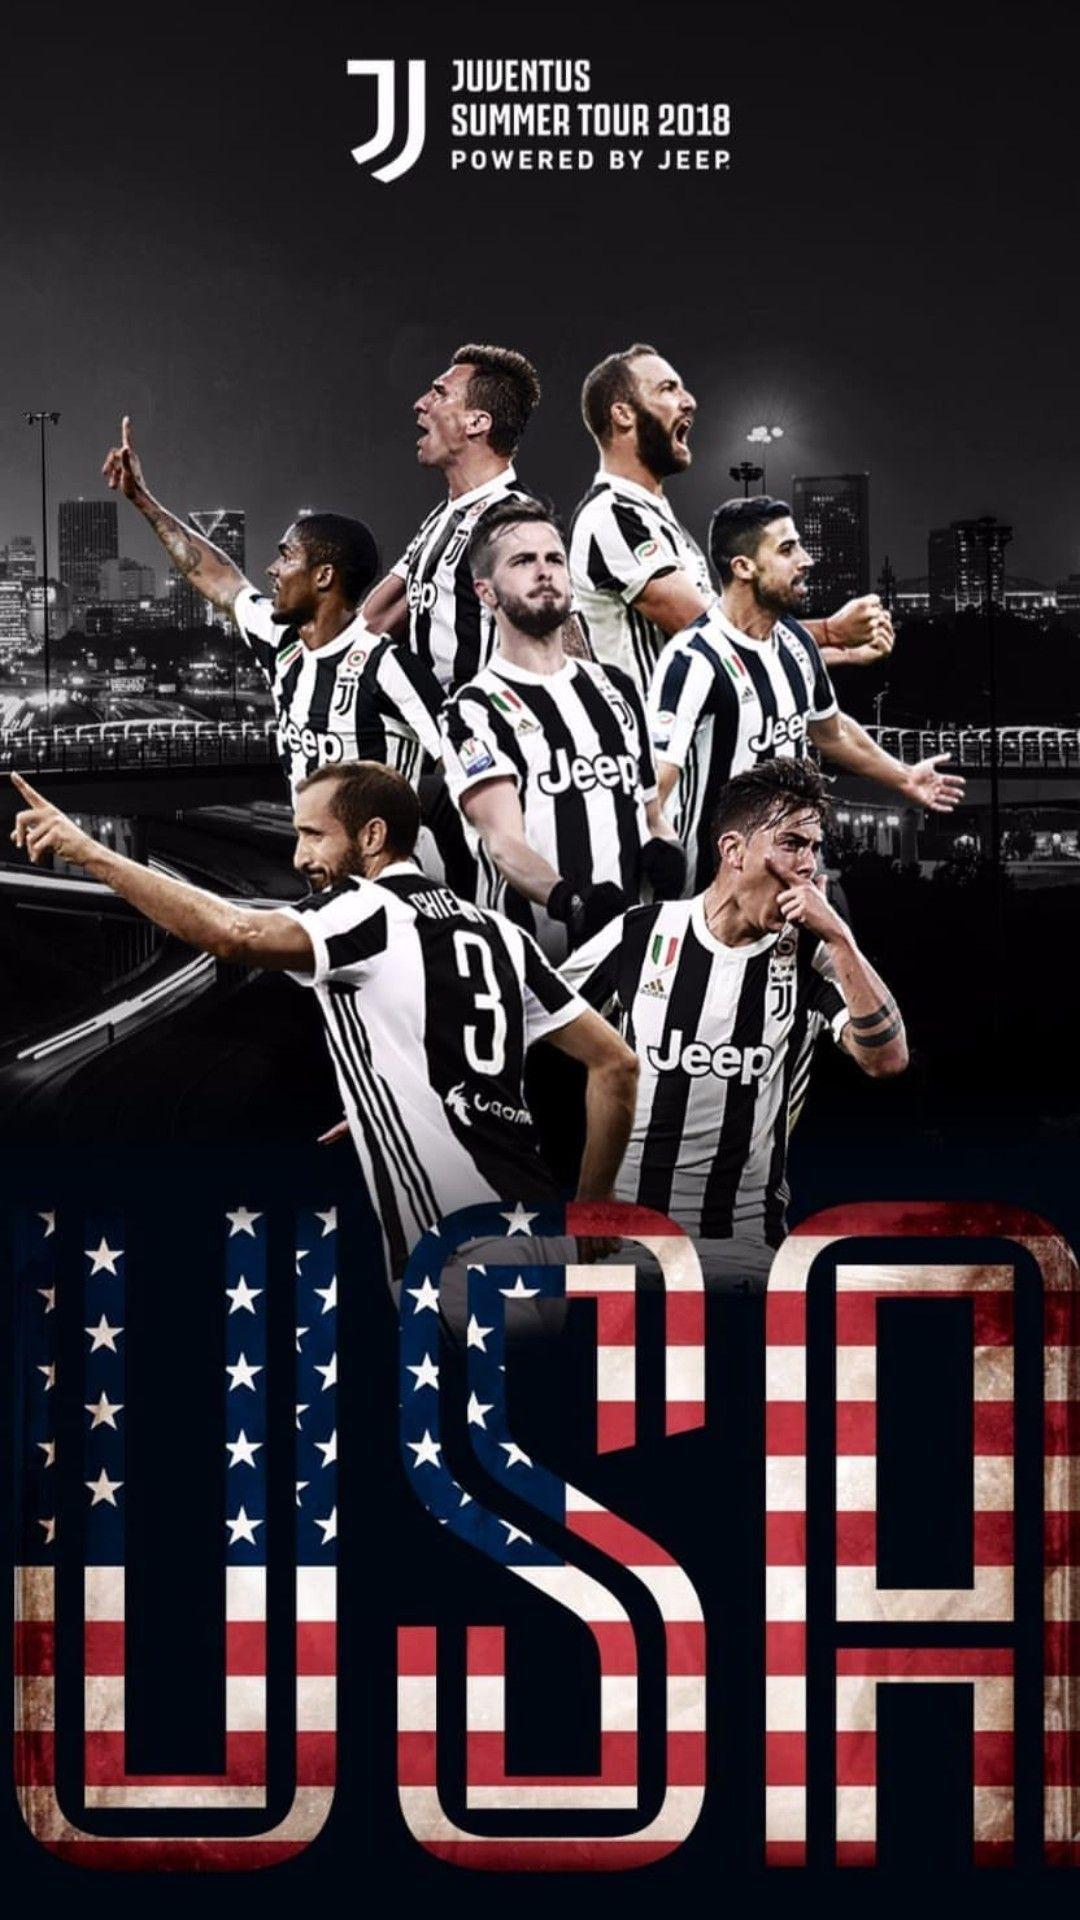 Juventus Summer Tour 2018 Usa Juventus Juventus Calcio Calciatori